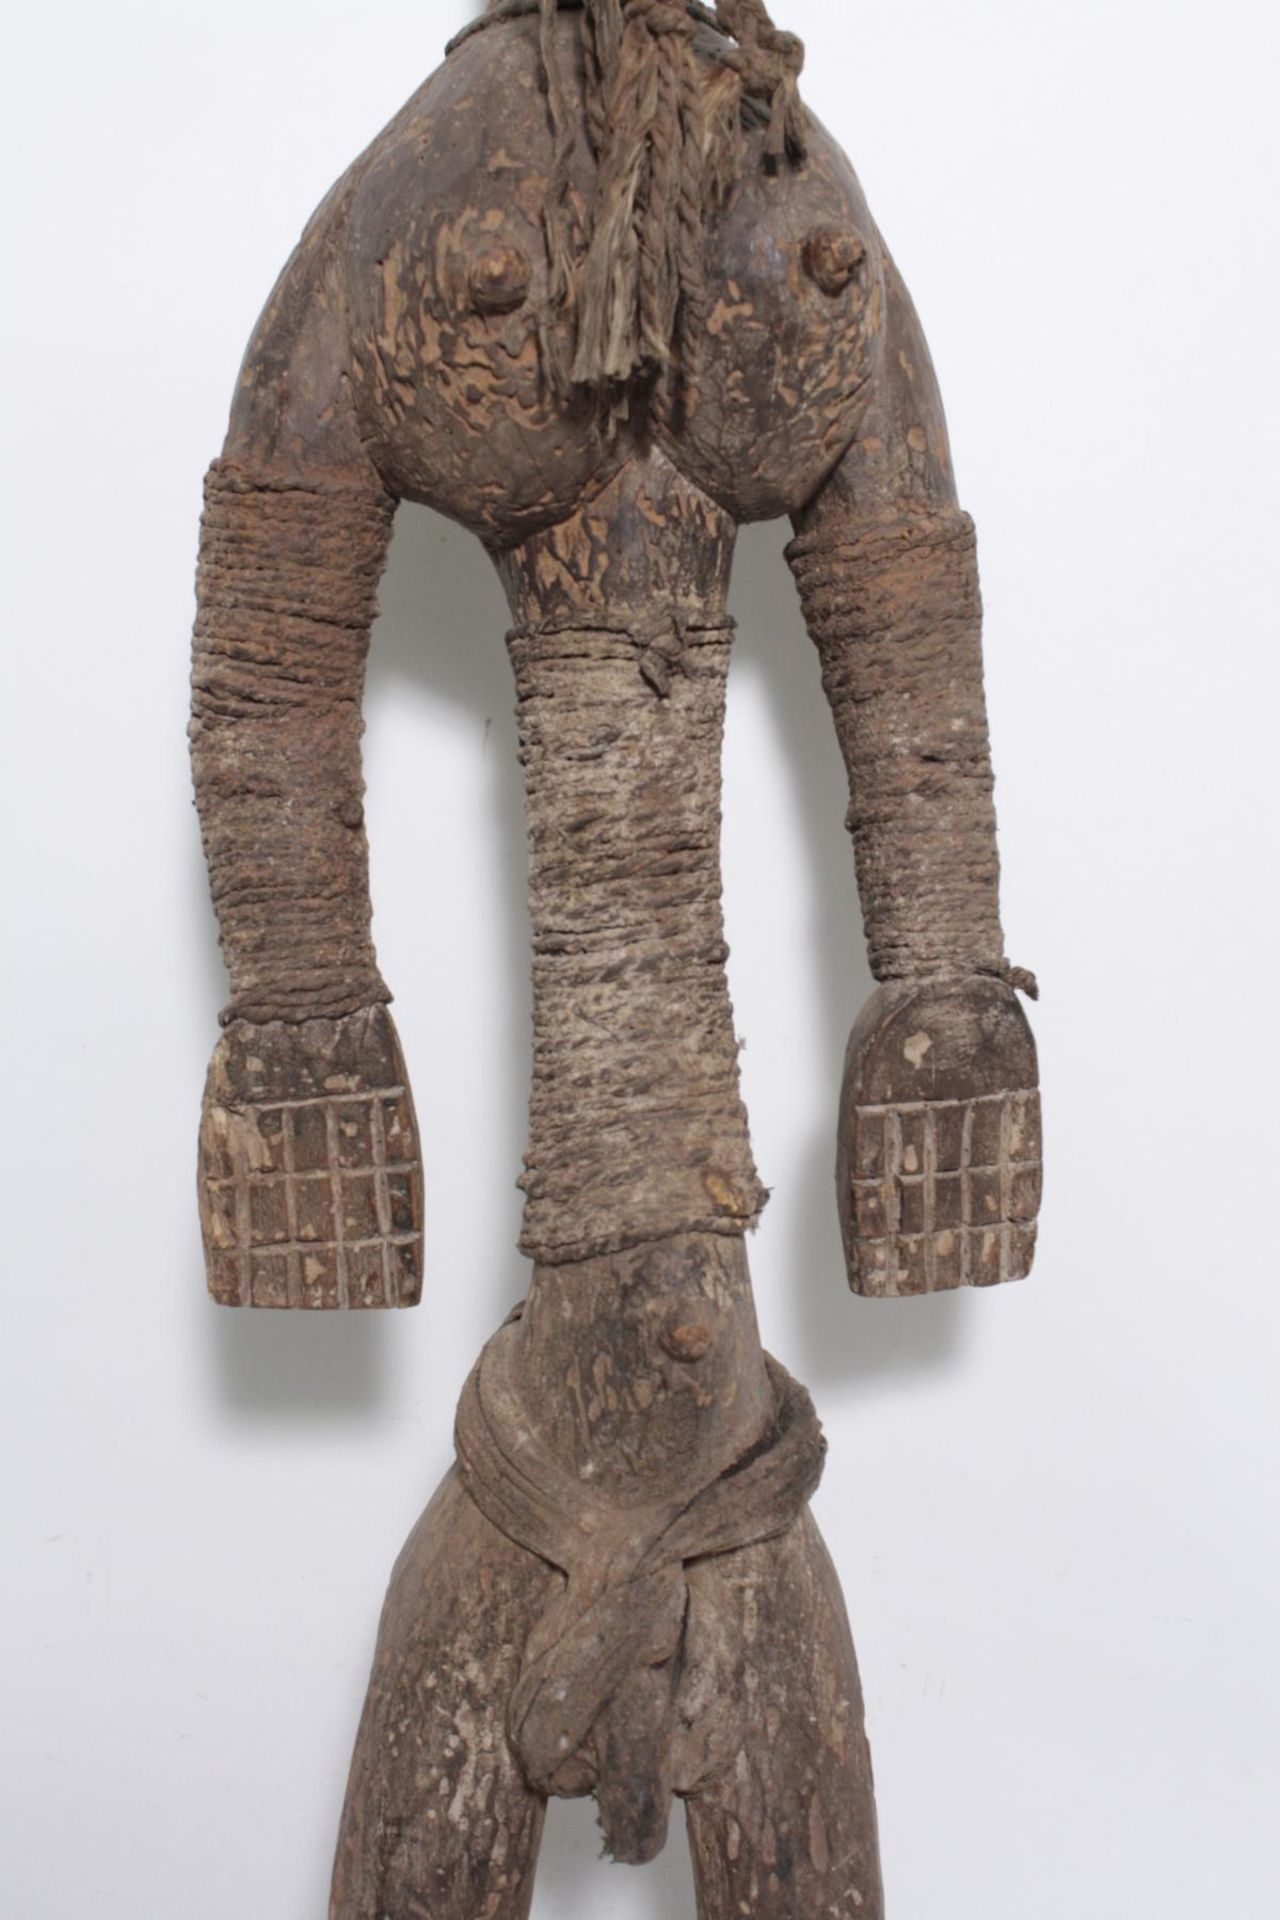 Ältere Große Figur, Dogon oder Bambara, Mali - Bild 3 aus 16